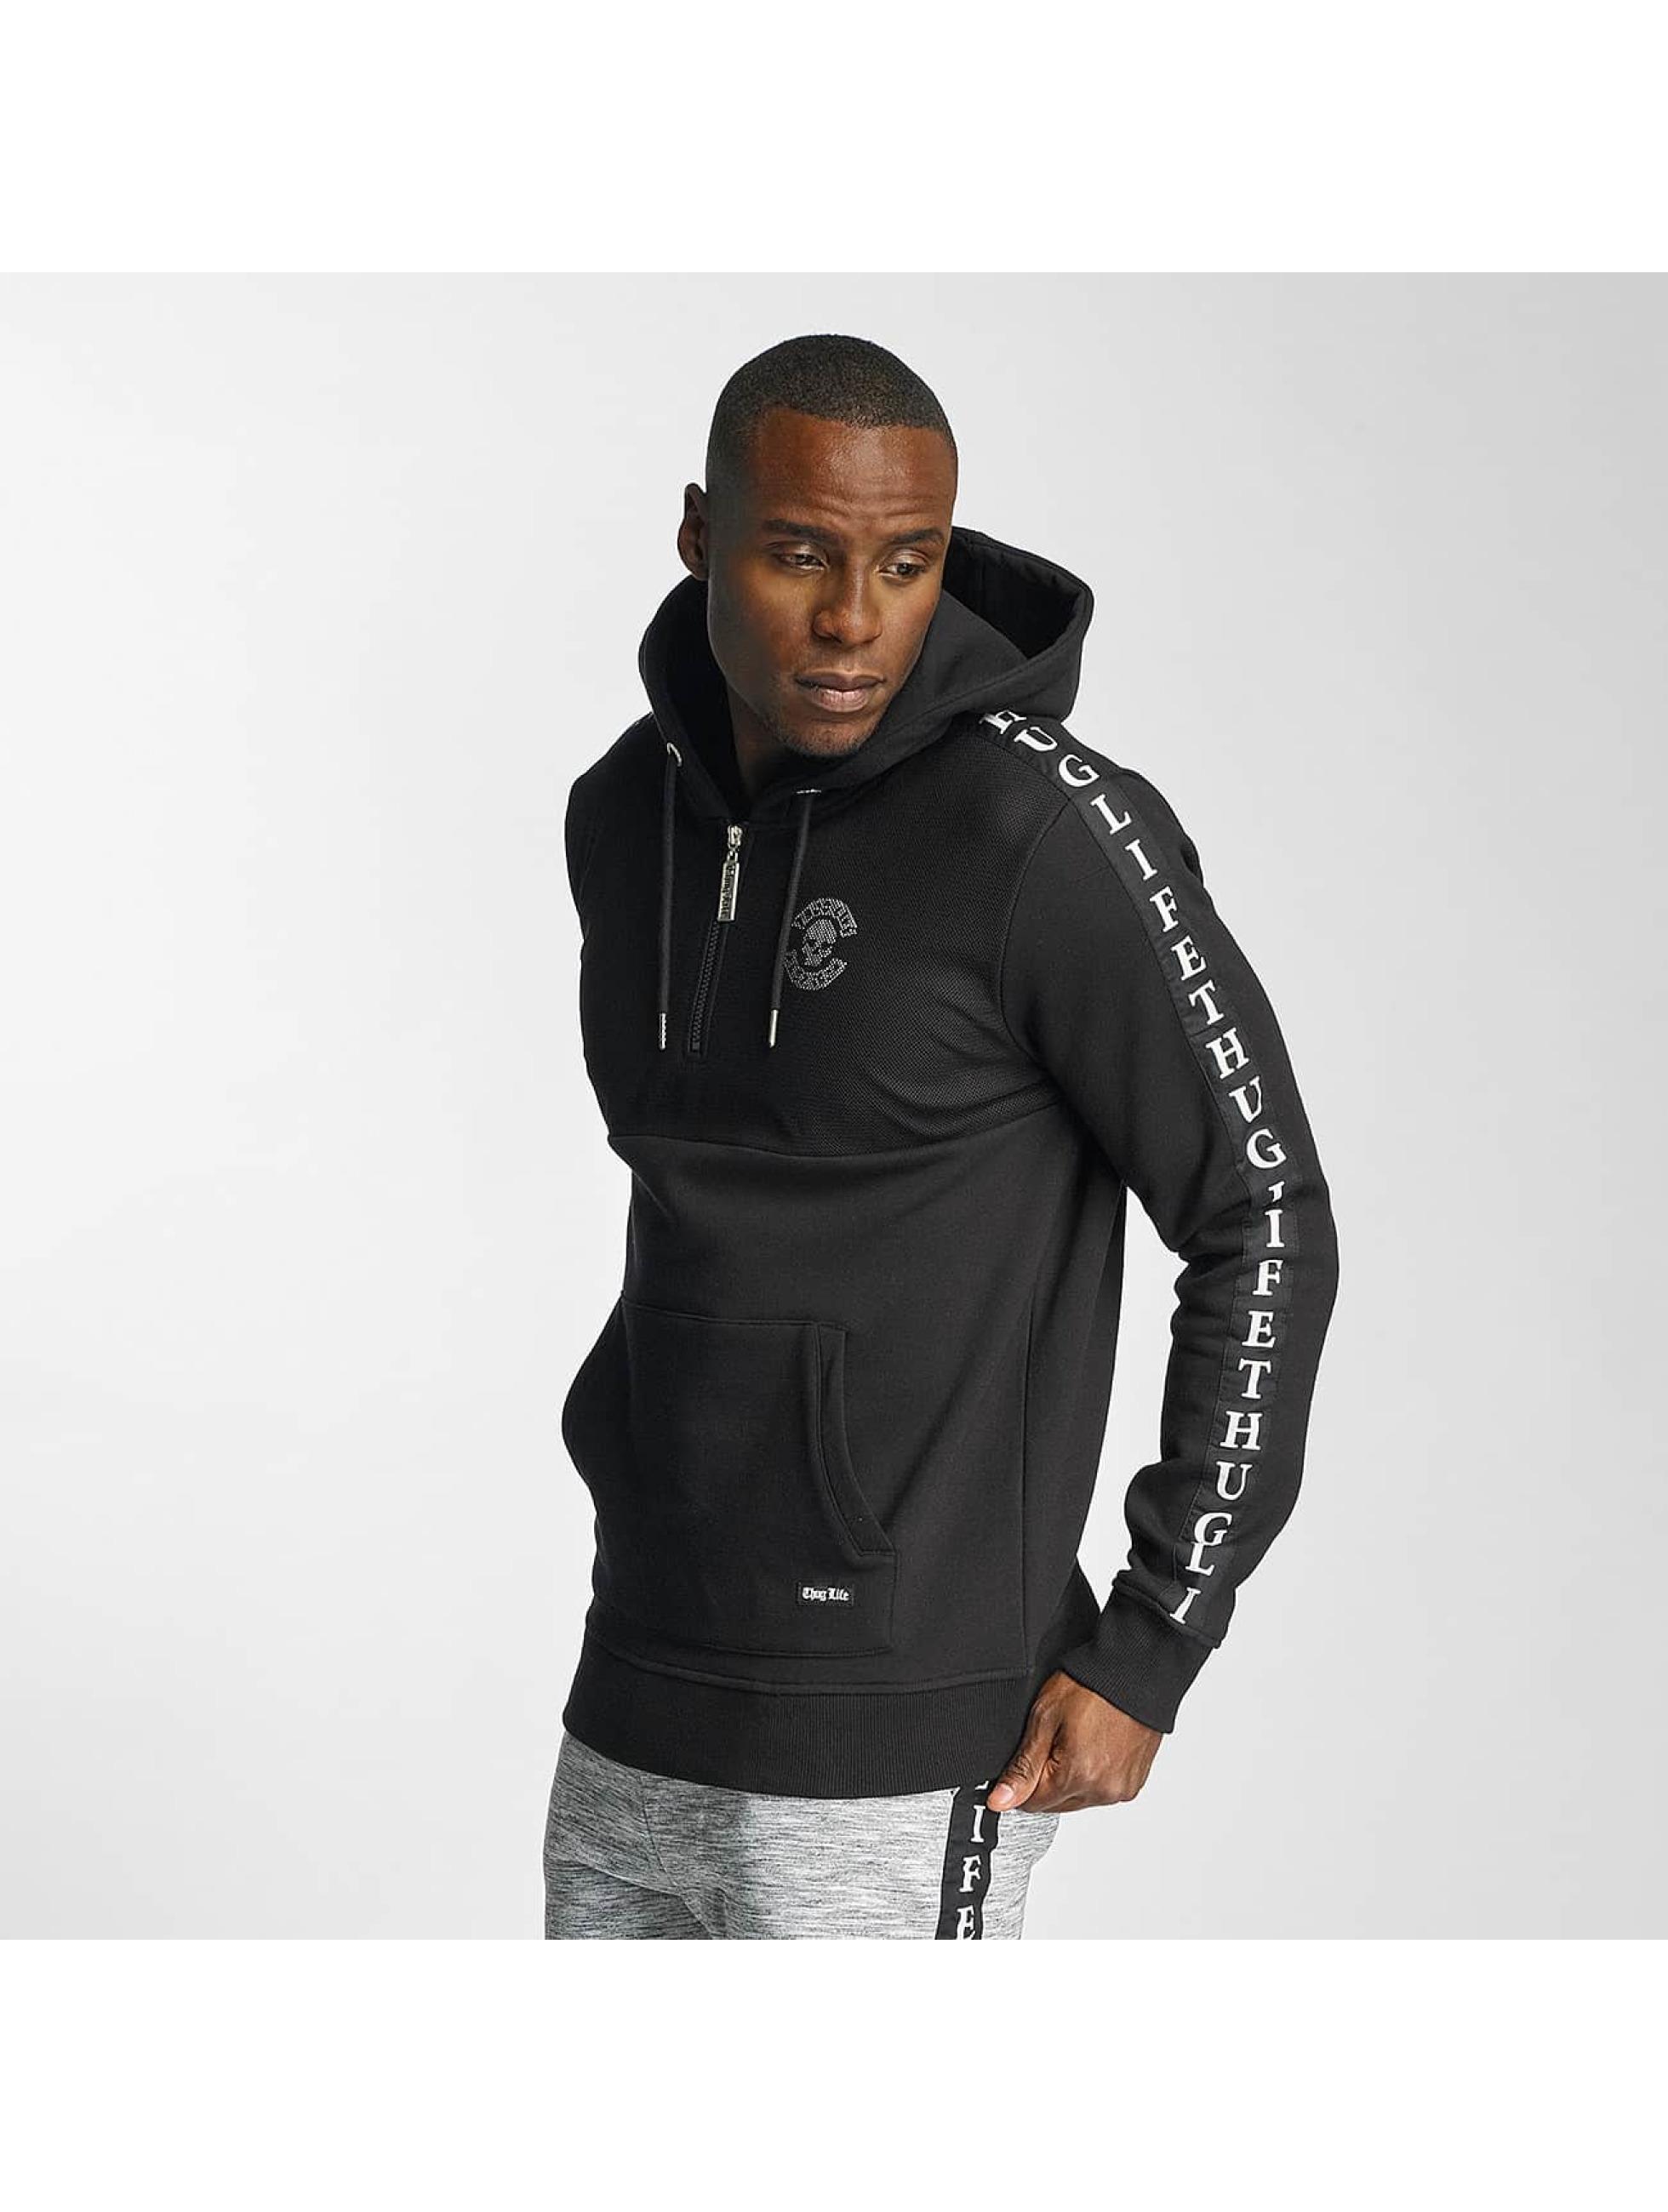 Thug Life / Hoodie Combine in black S